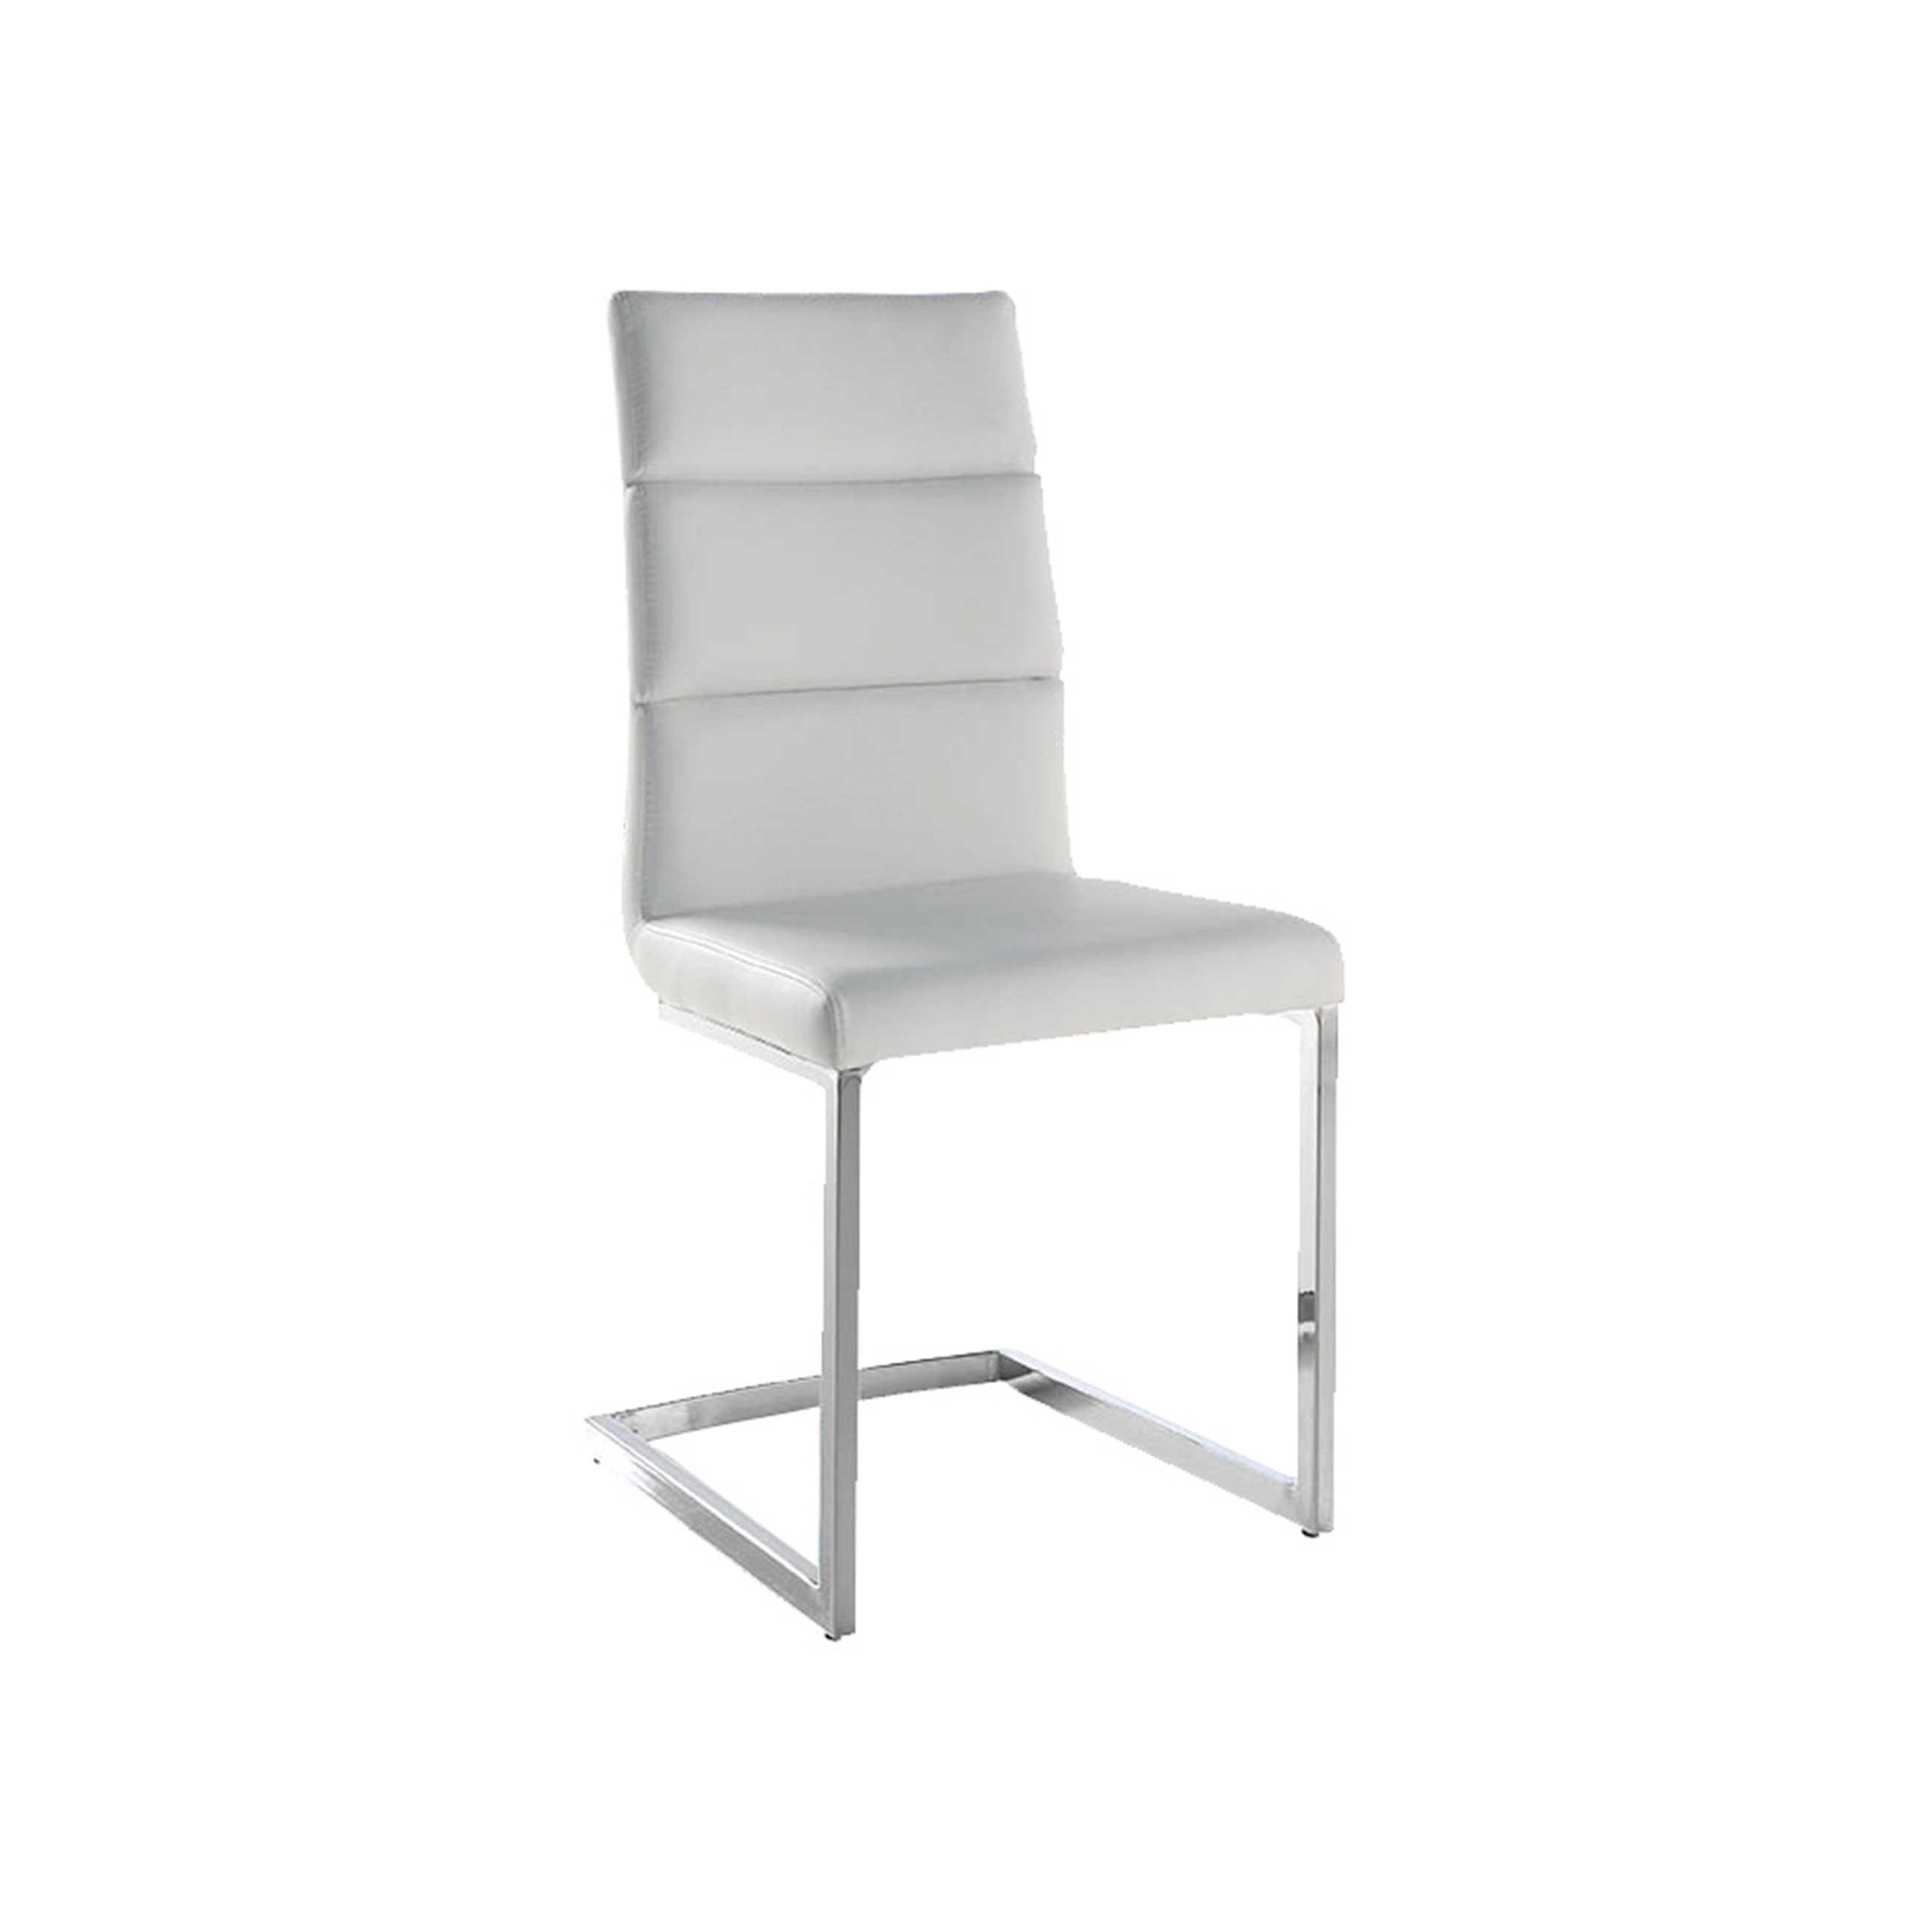 Pack 4 sillas polipiel color blanco mod. Milo